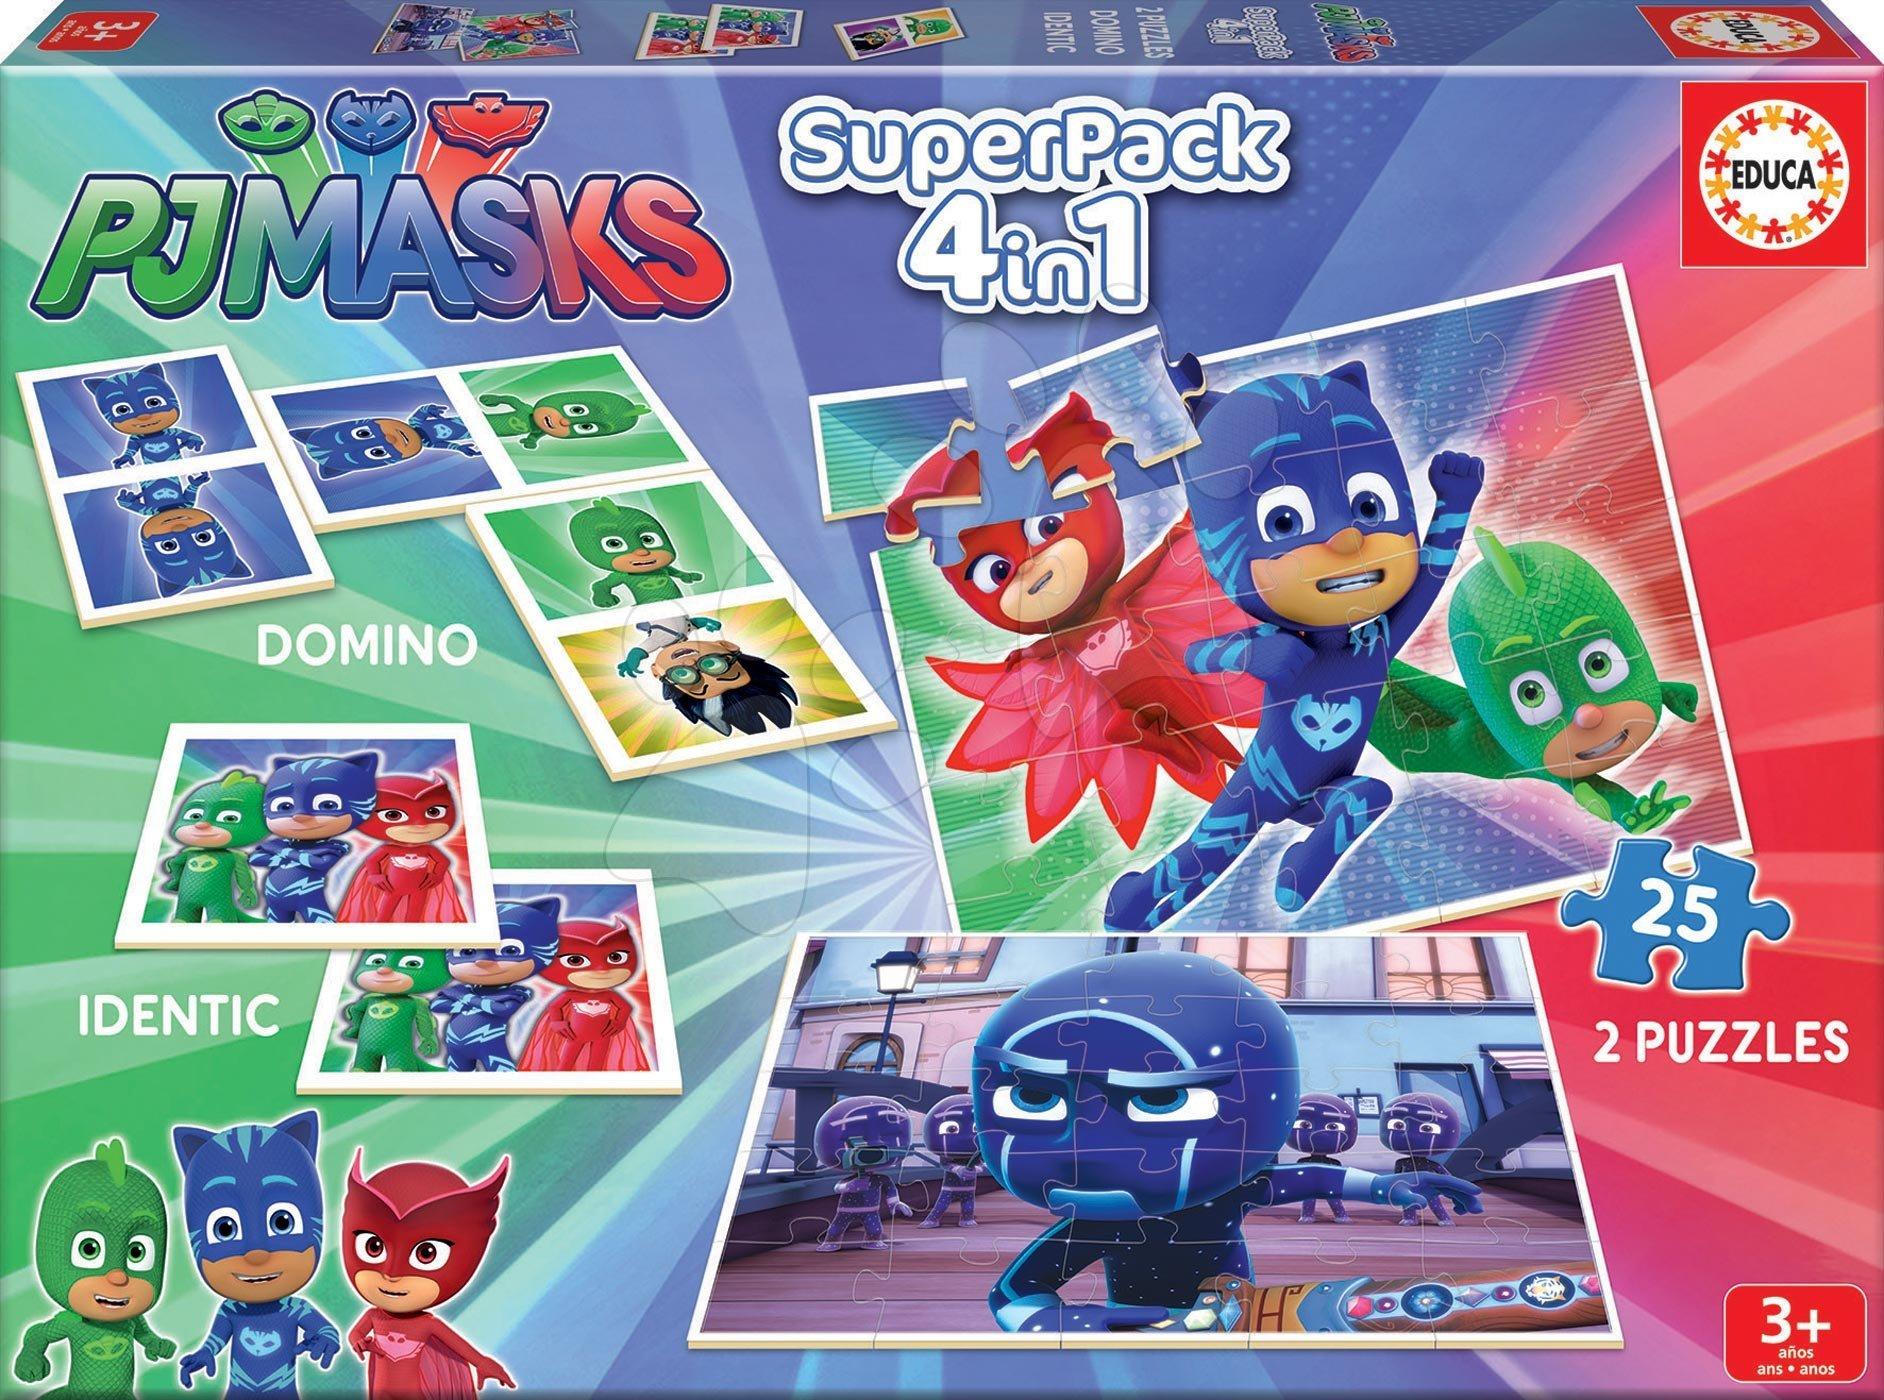 Puzzle PJ Masks SuperPack 4v1 Educa 2x puzzle, domino, pexeso